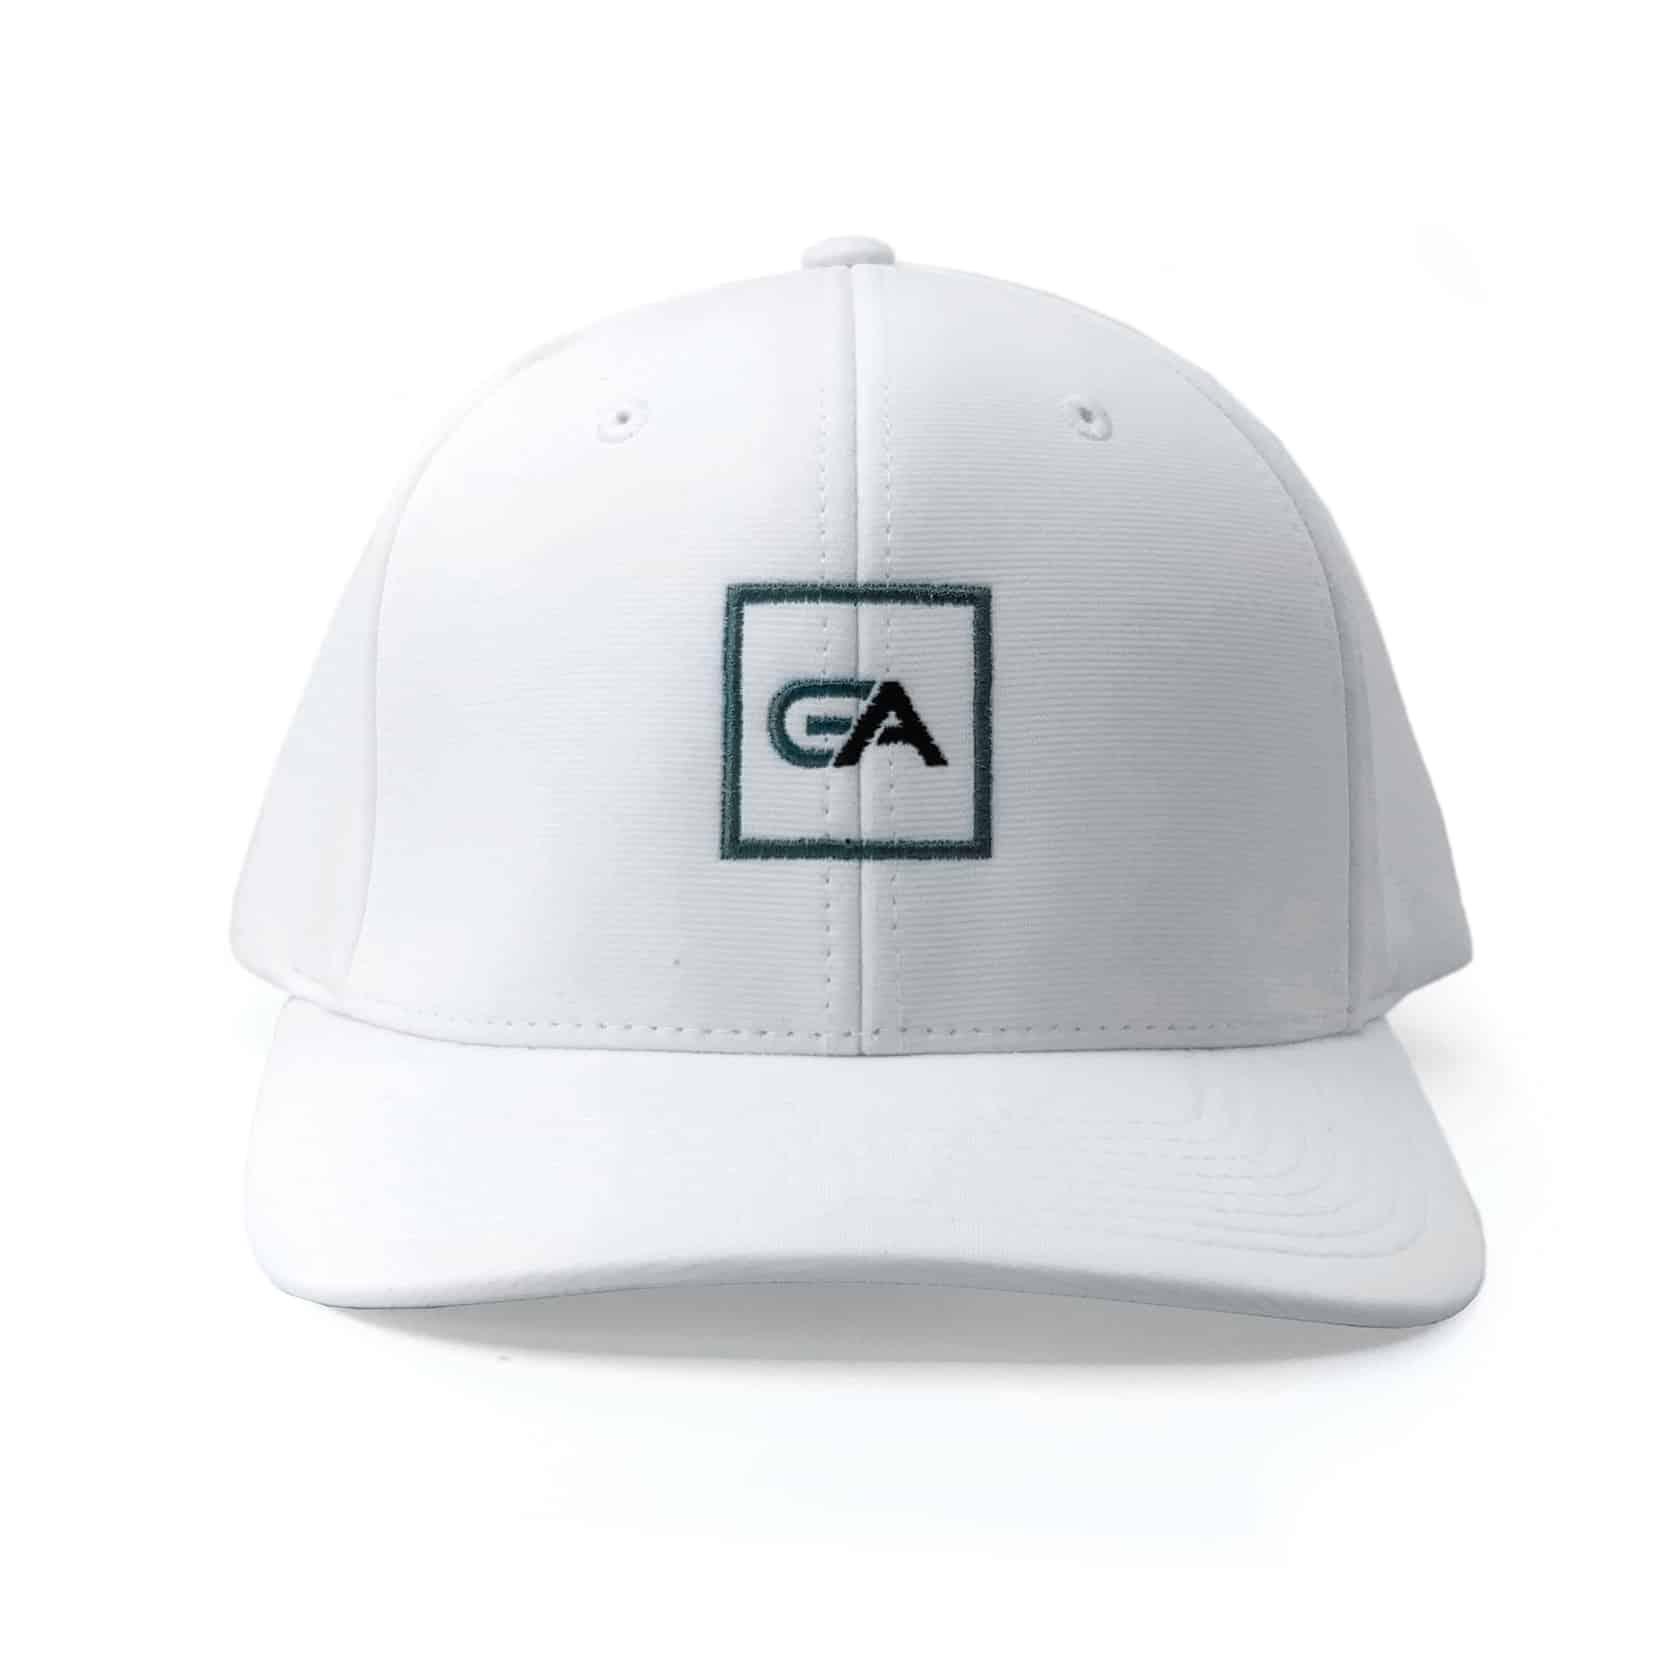 ga3 1 1 1